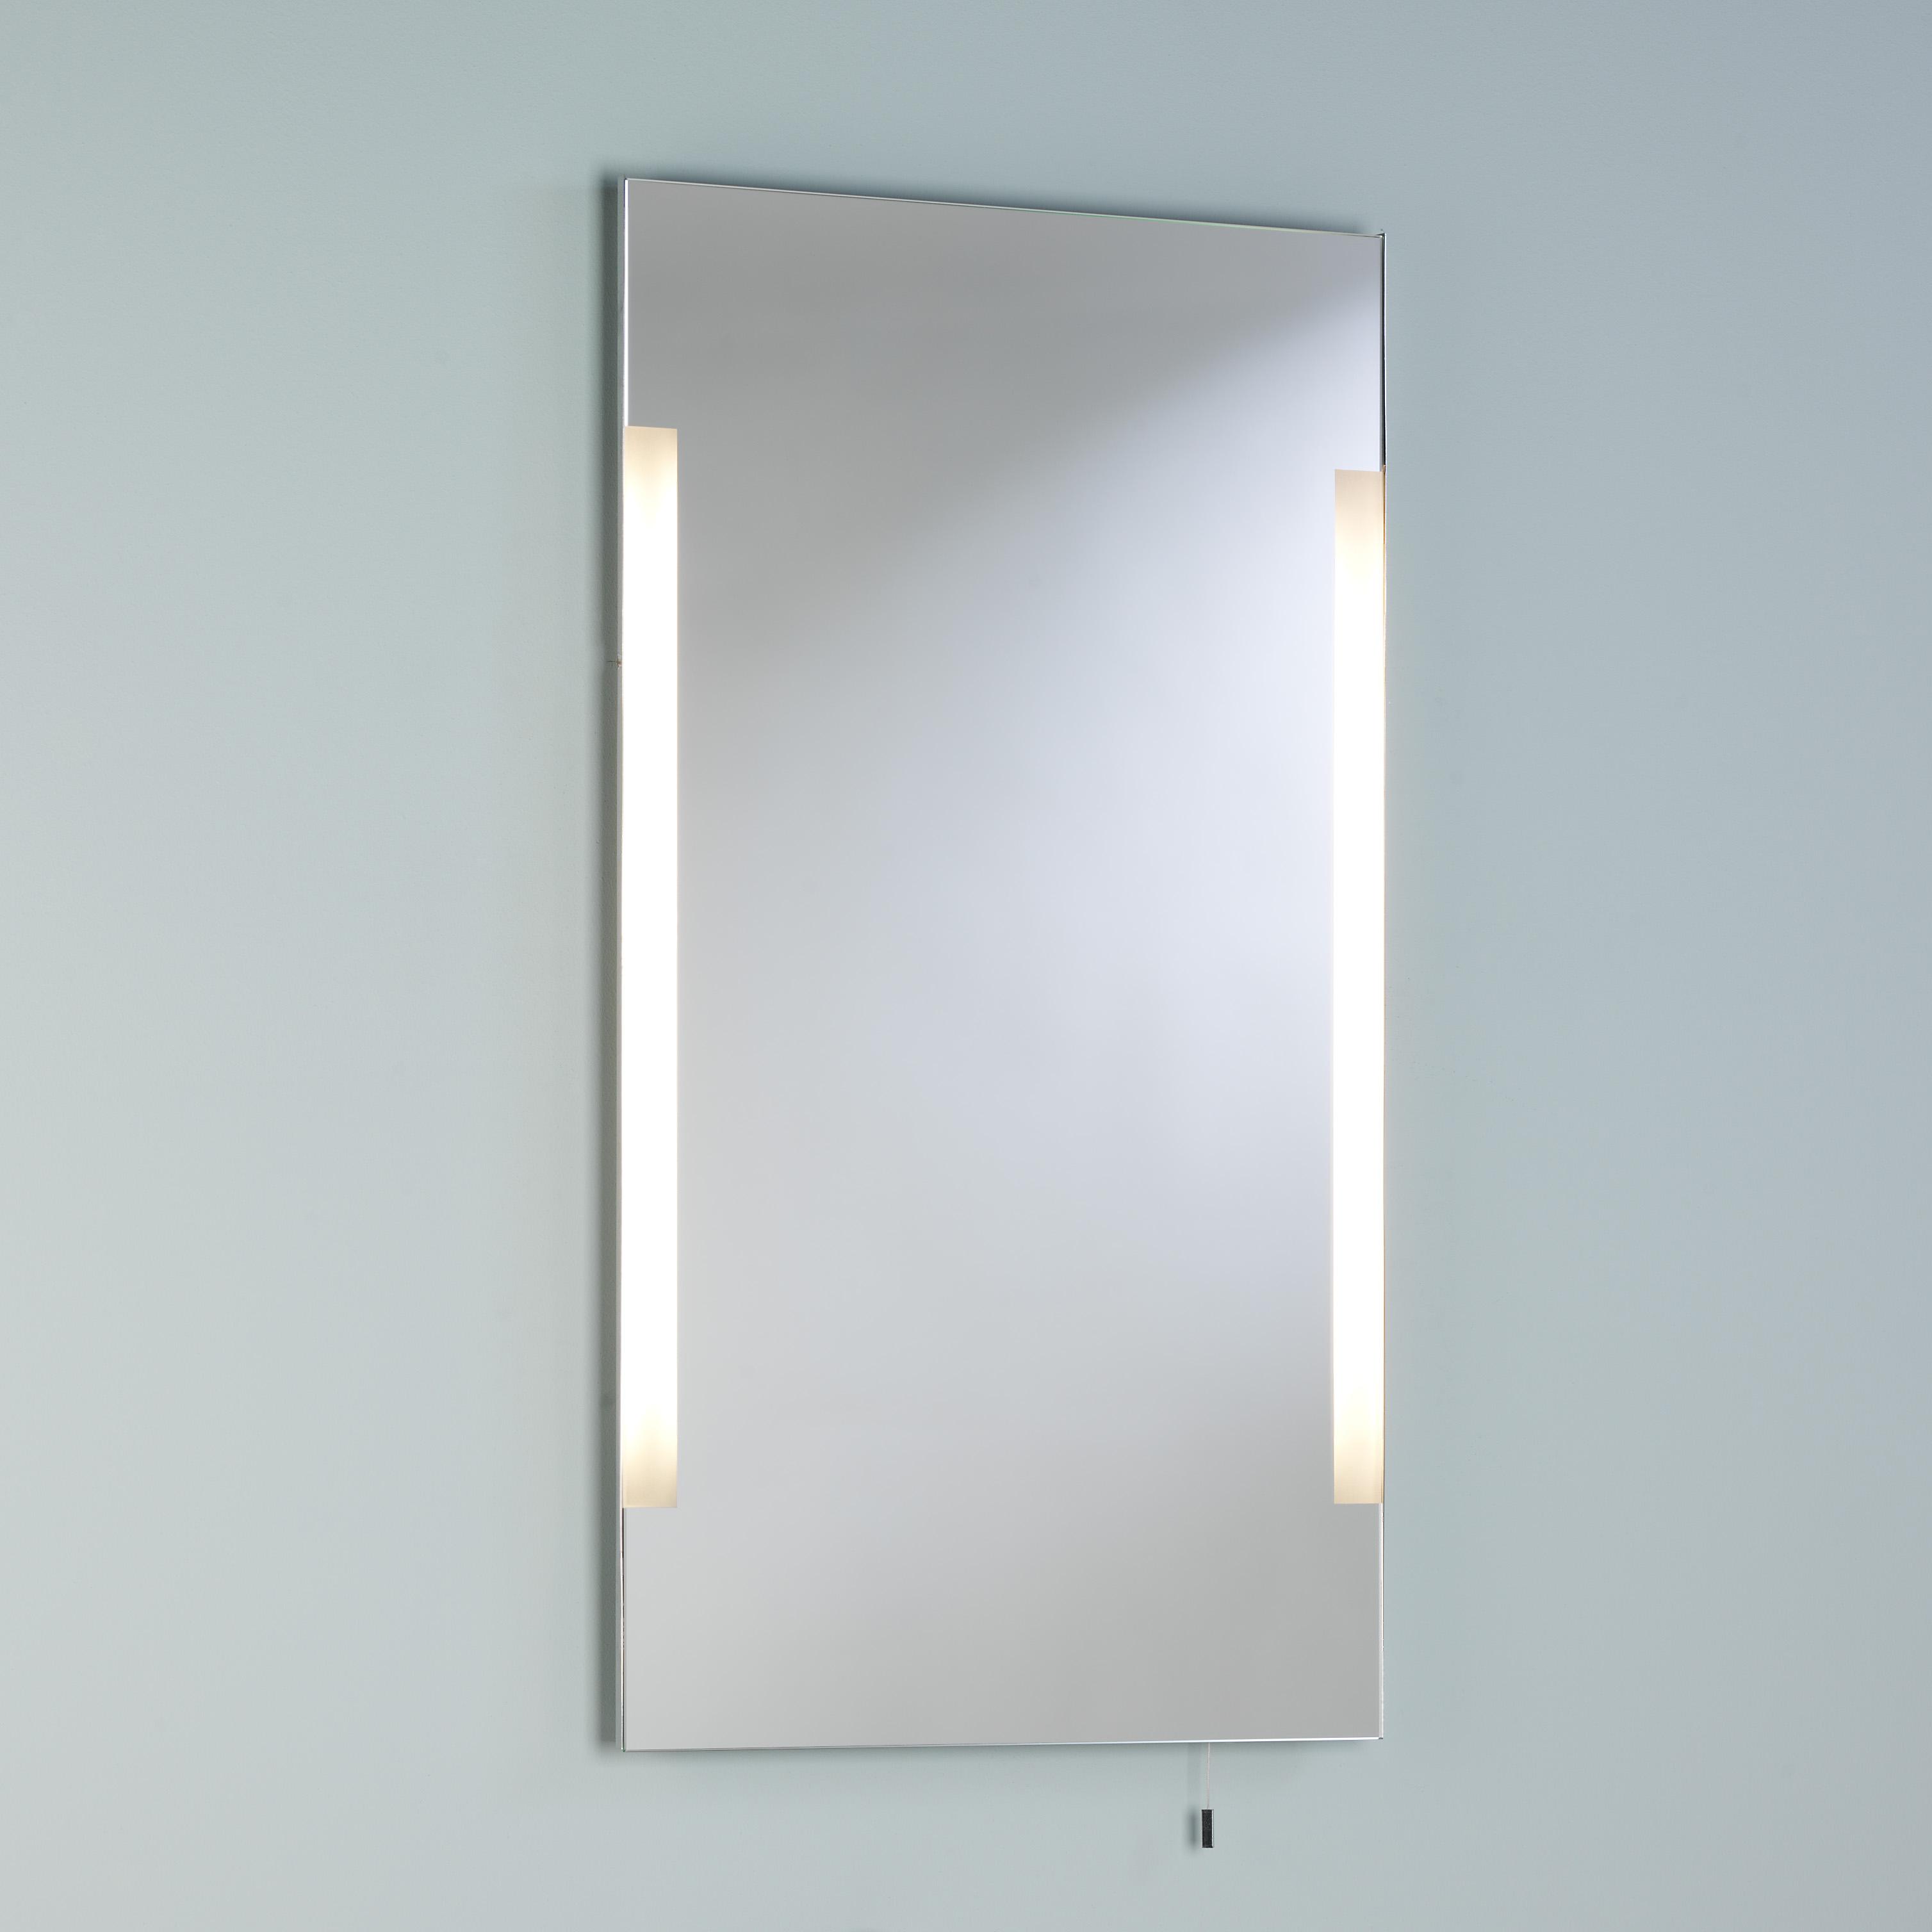 Astro 1071001 Imola 800 Mir Light+2xT5s